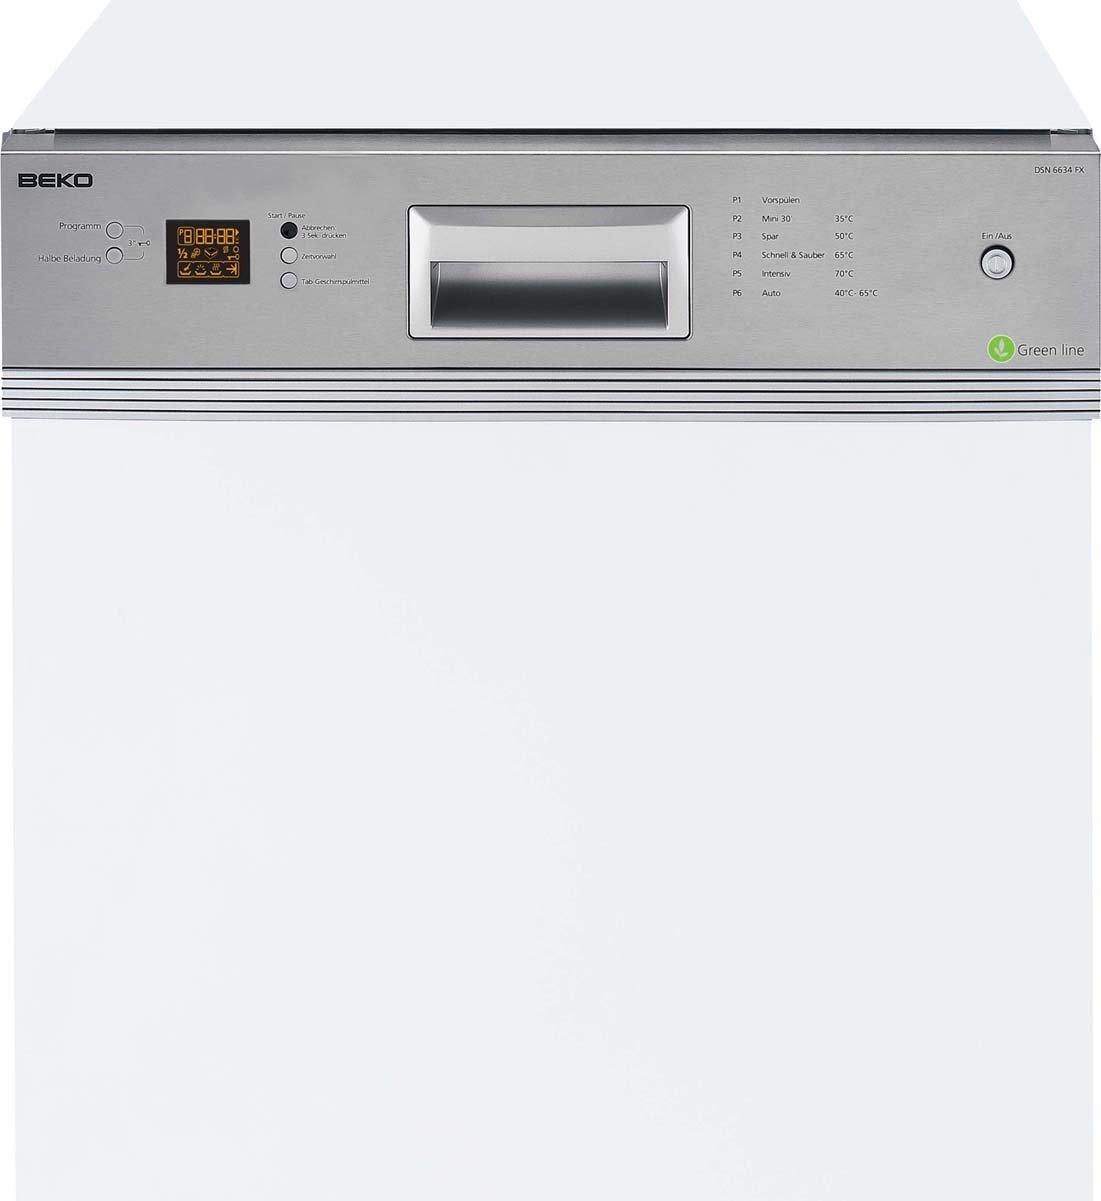 Beko DSN 6634 FX